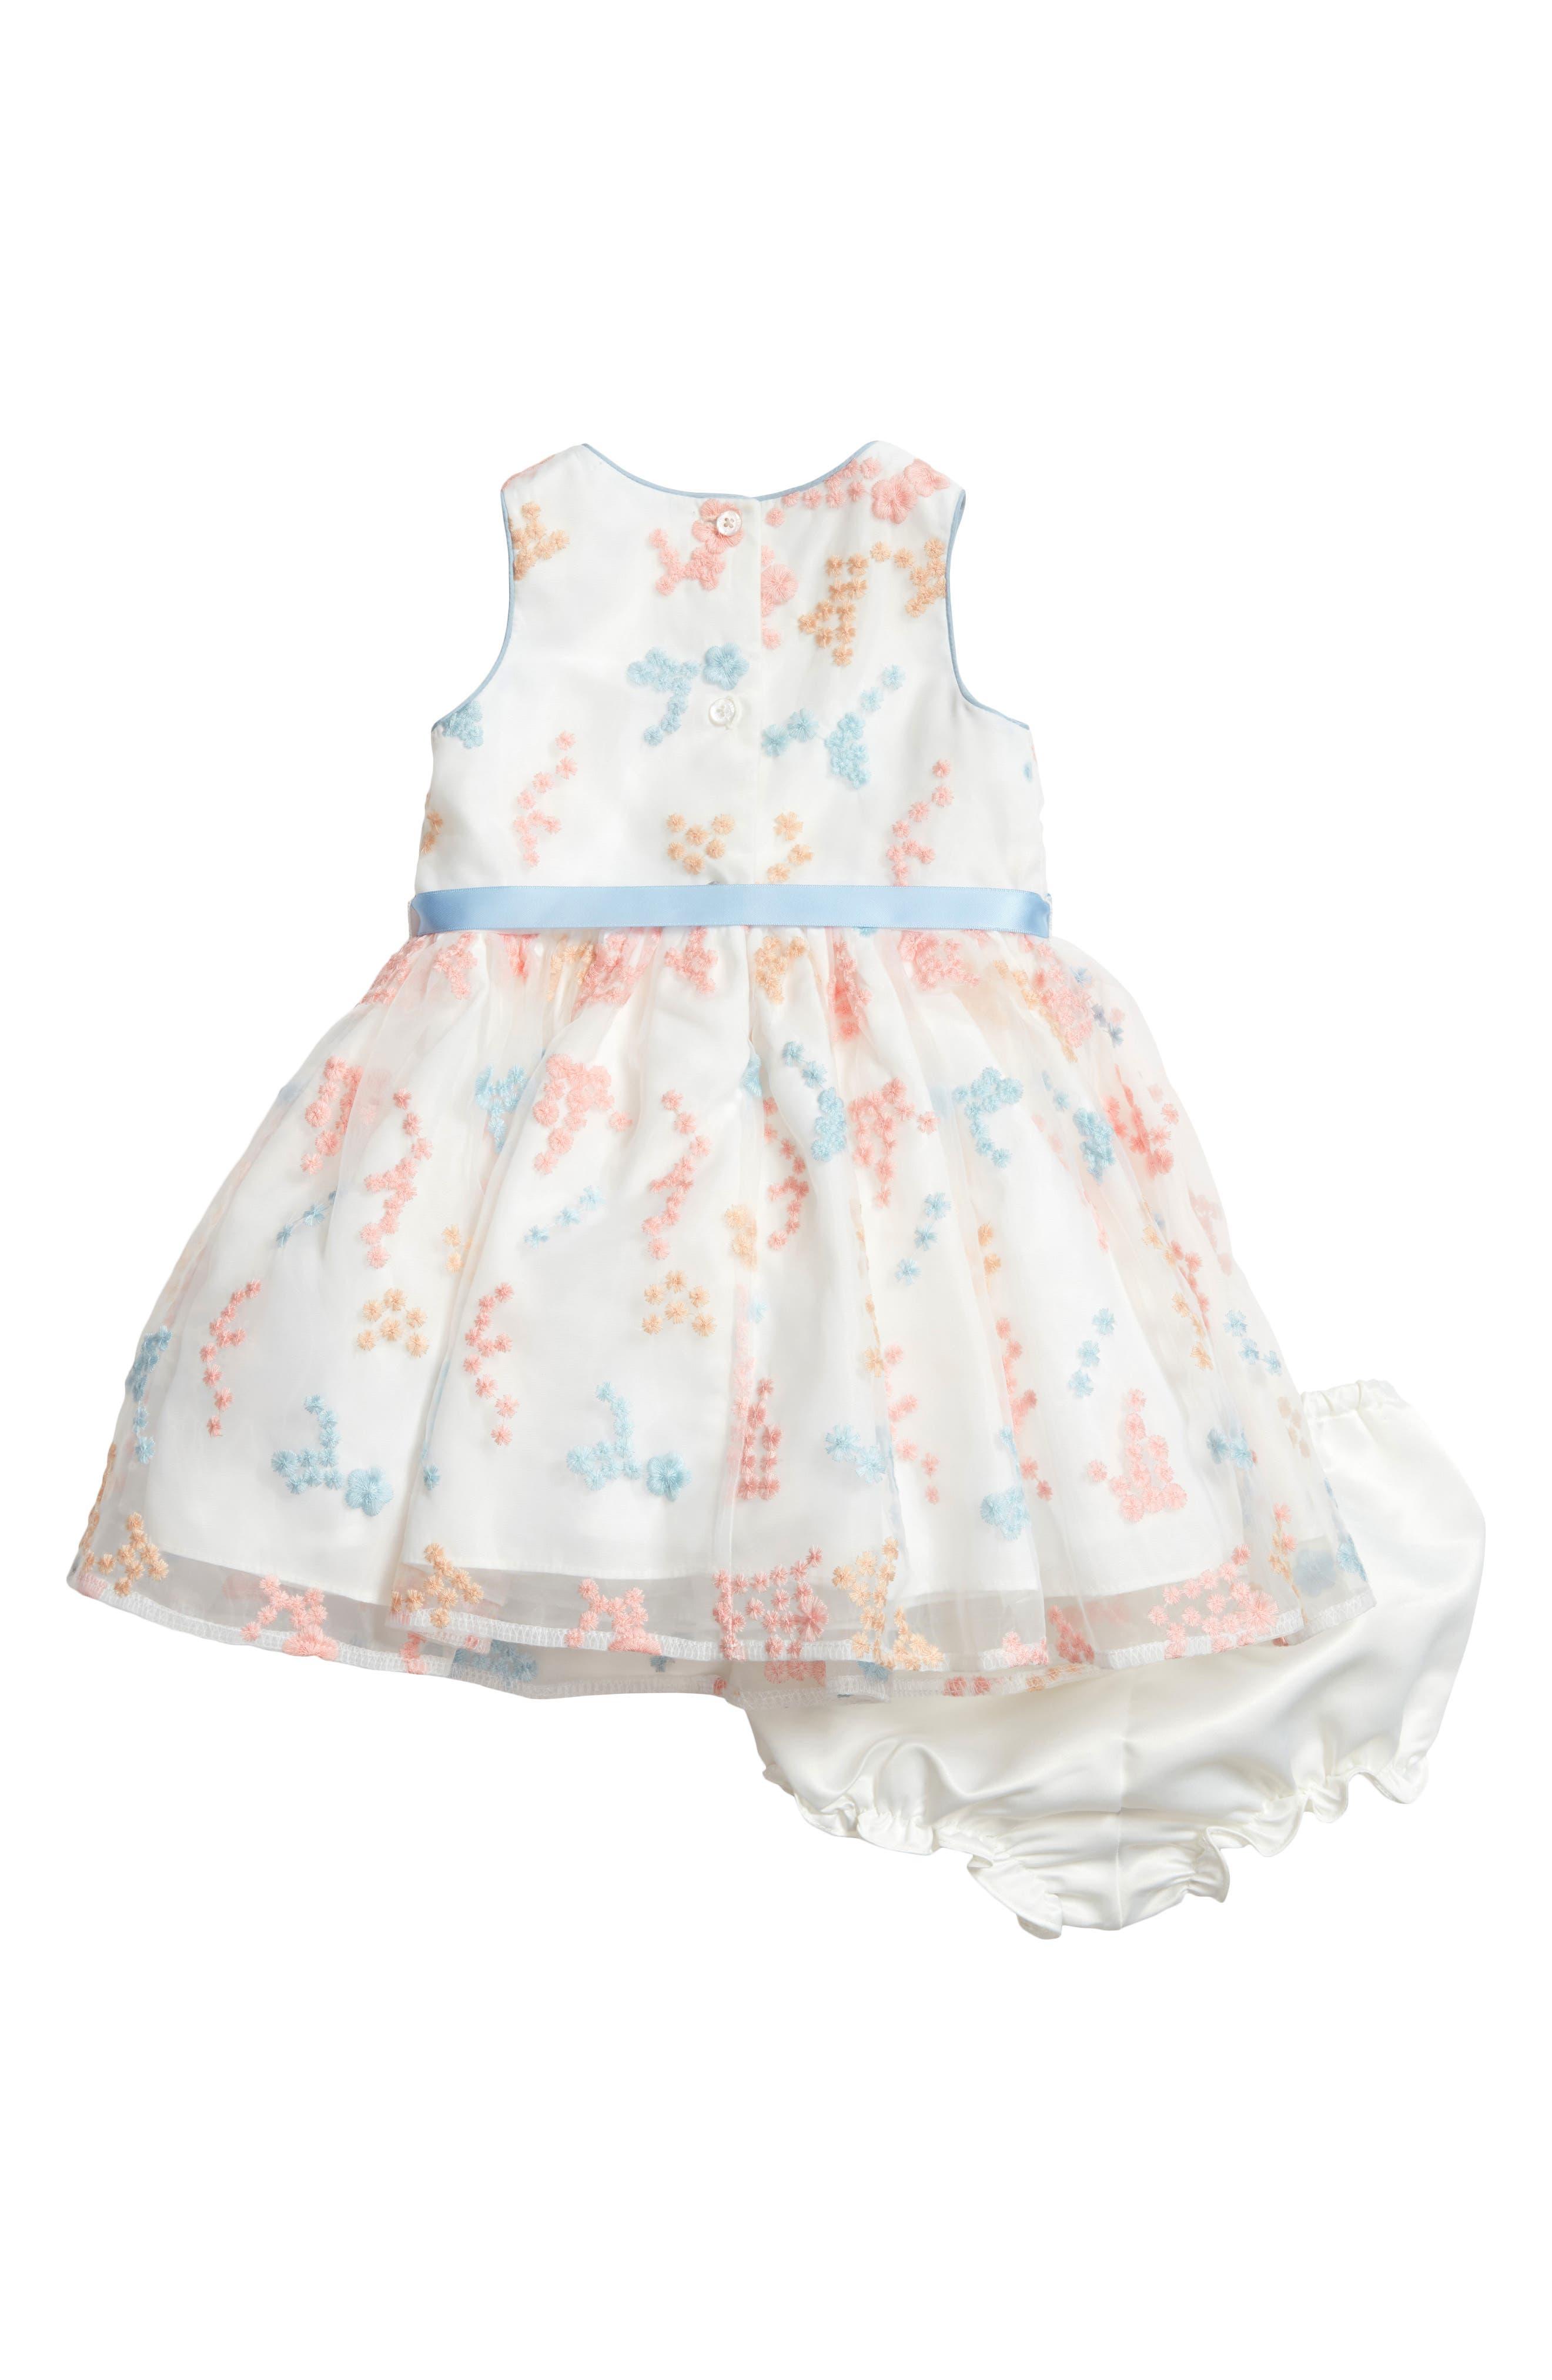 Embroidered Flower Dress,                             Alternate thumbnail 2, color,                             Ivory Multi